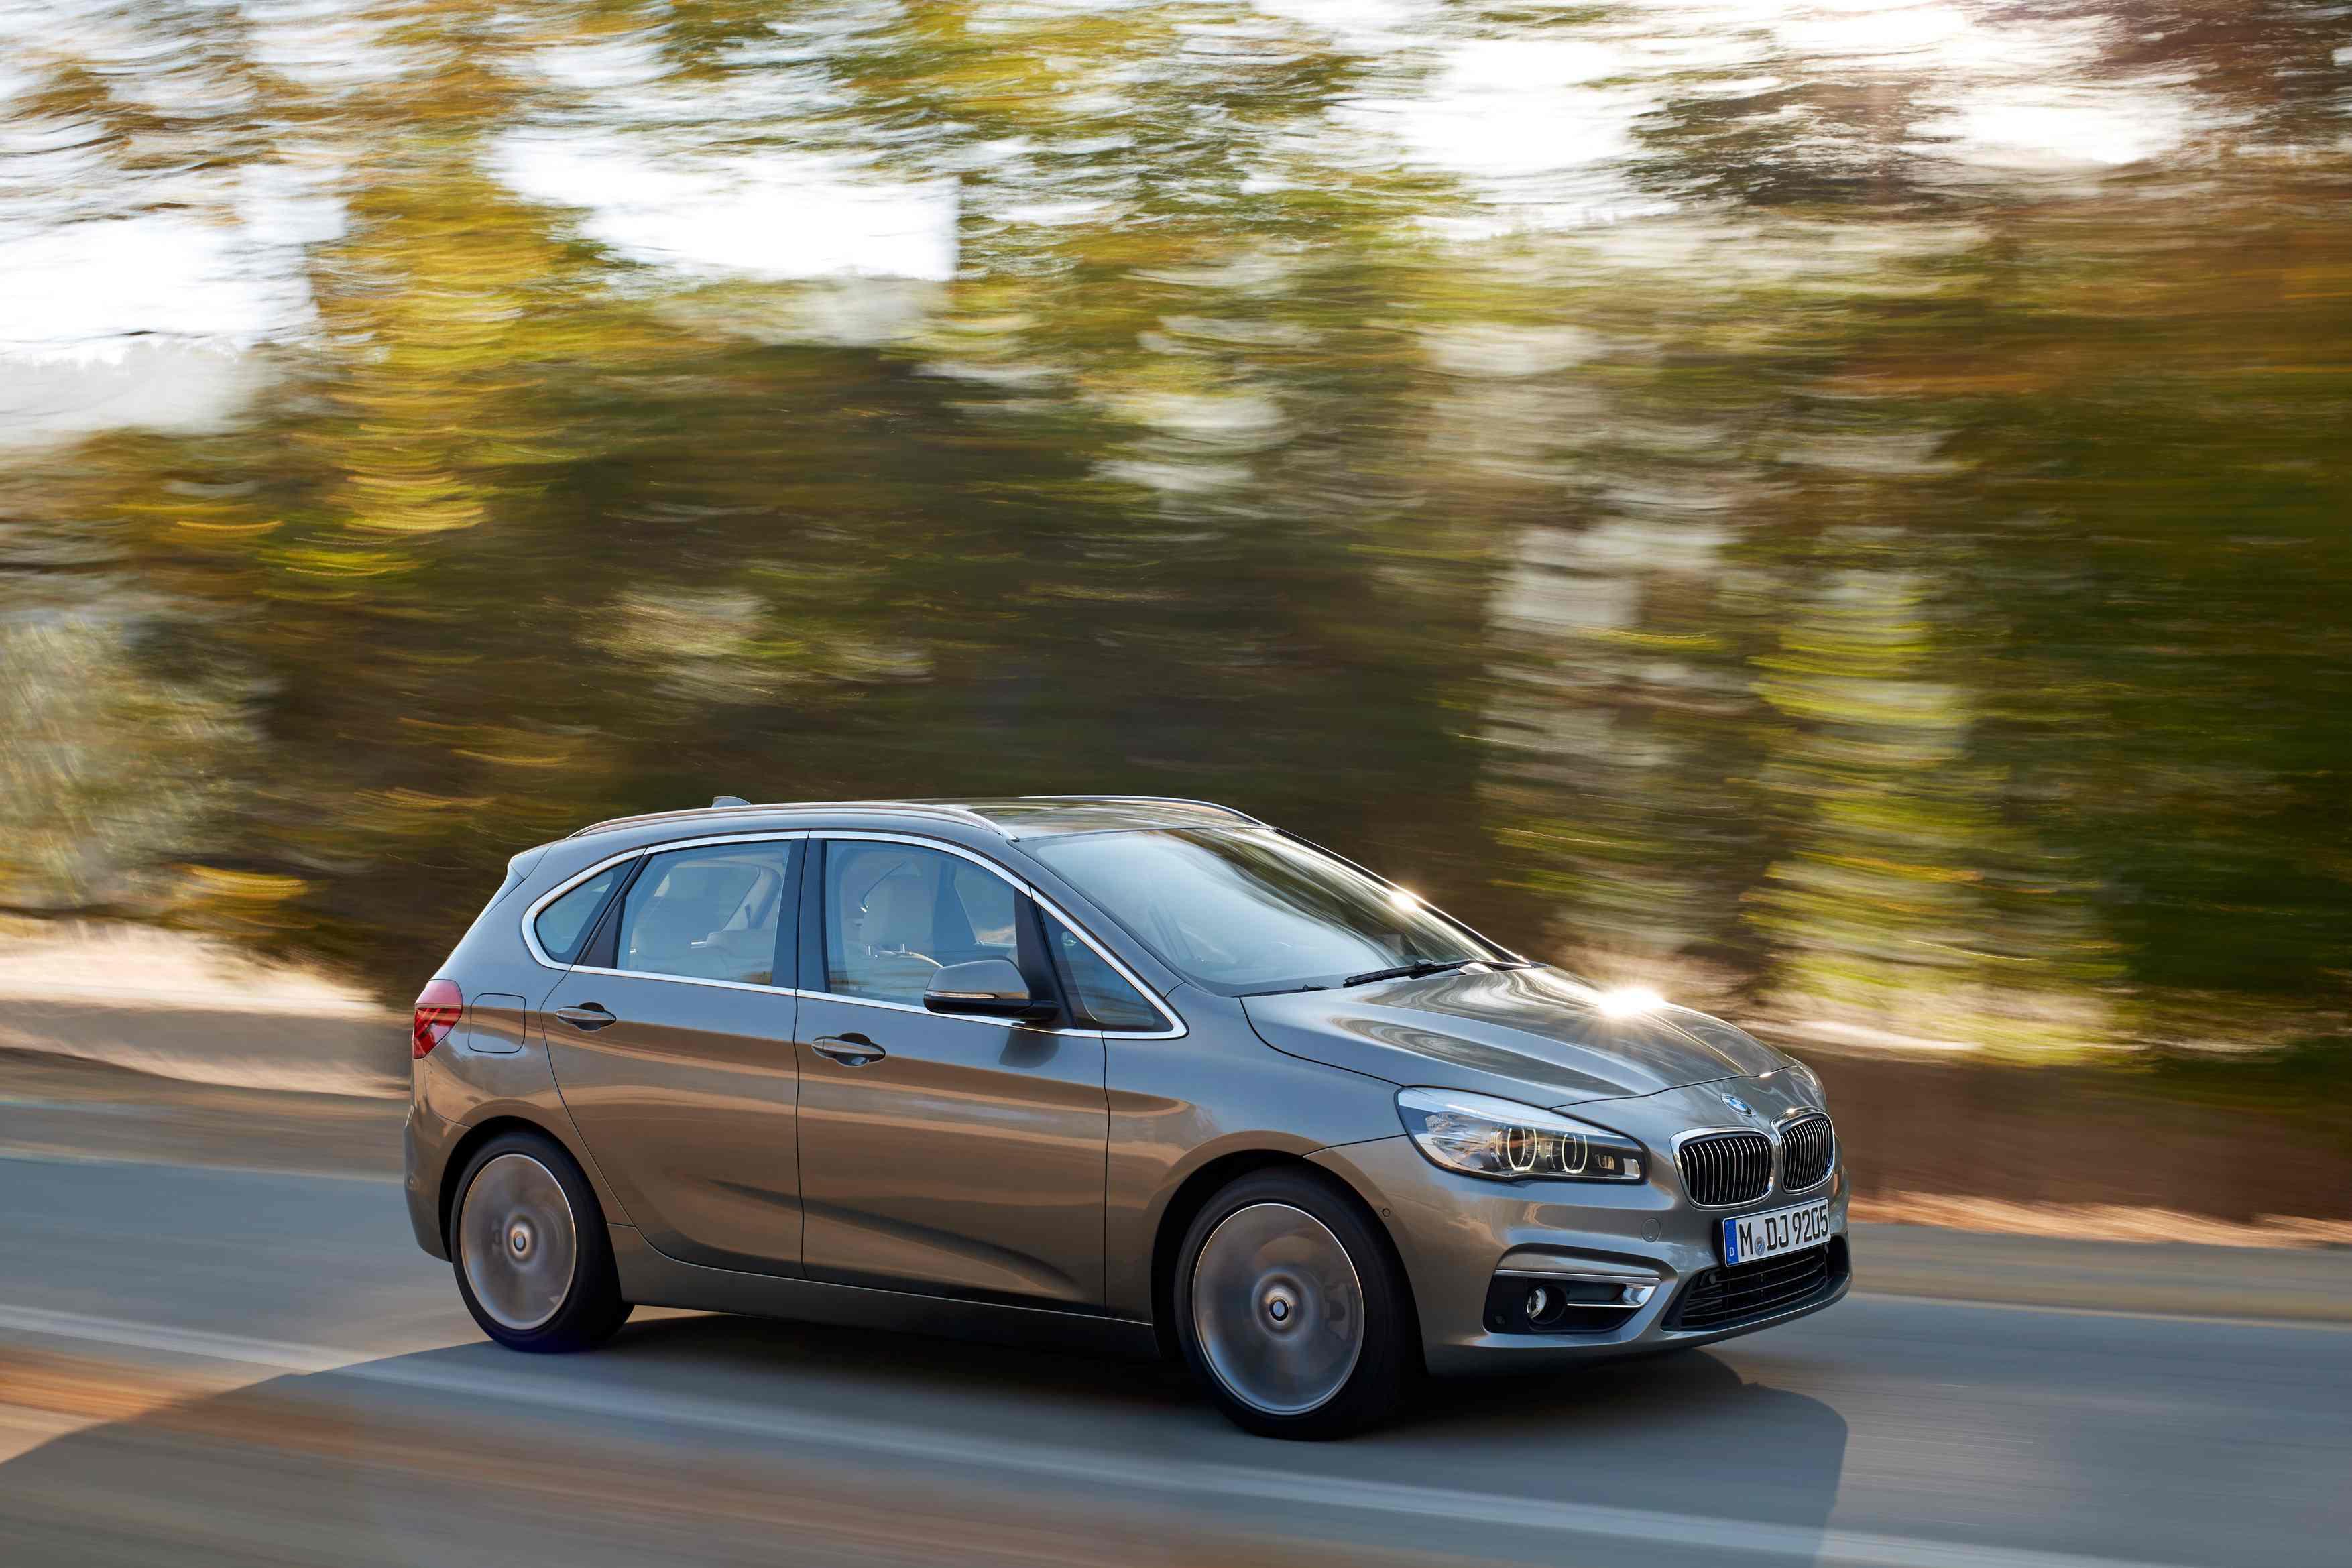 BMW Births New MPV: Latest News - Surf4cars.co.za Motoring News